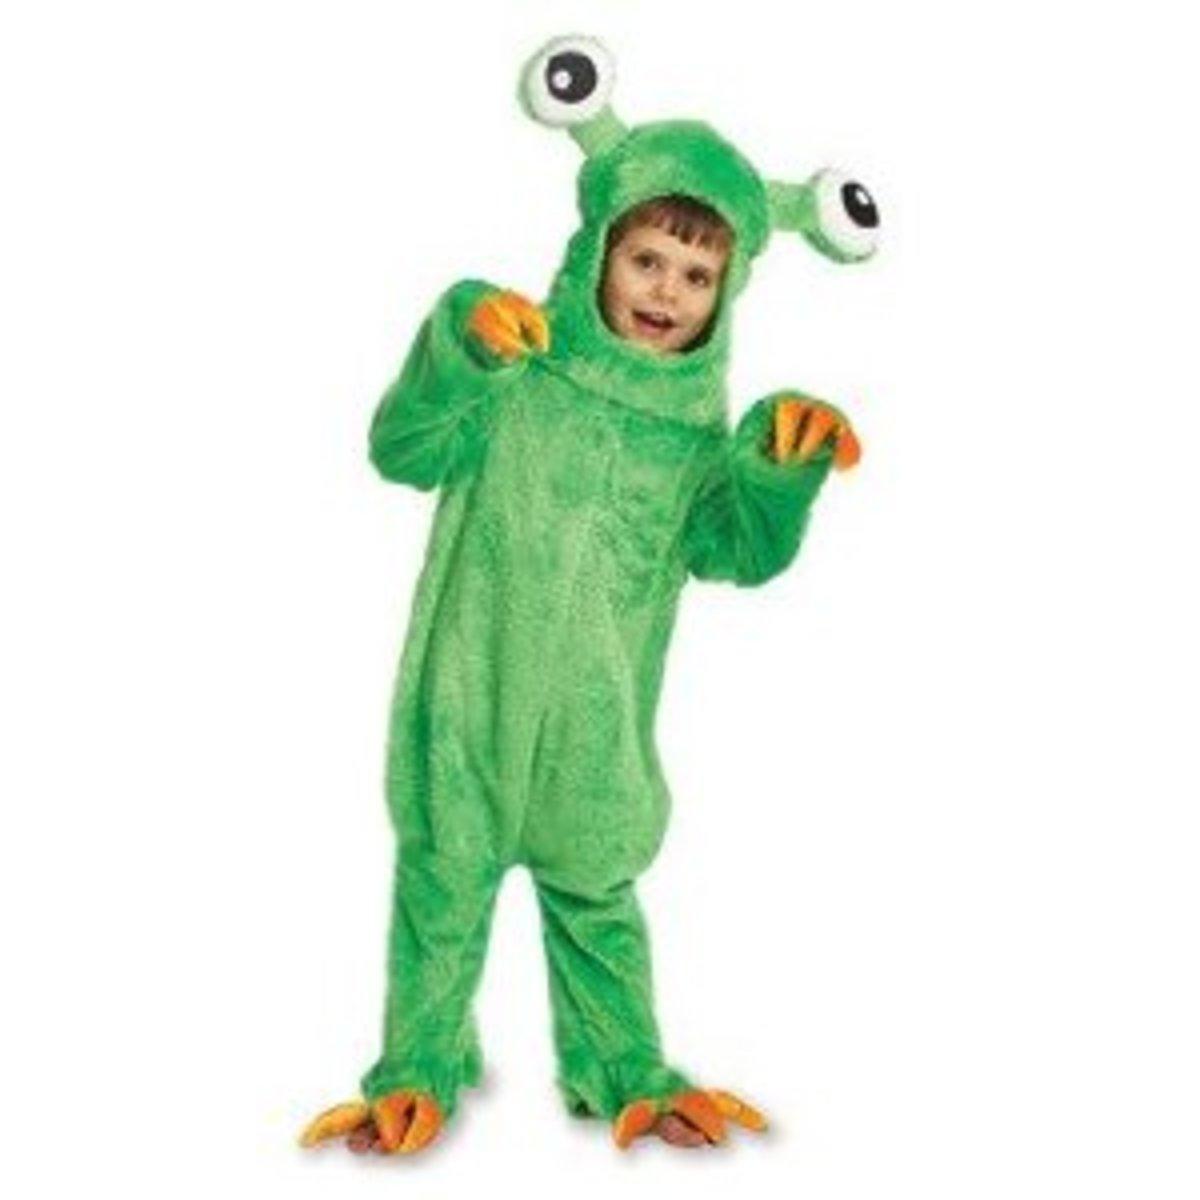 Big Green Monster Costume